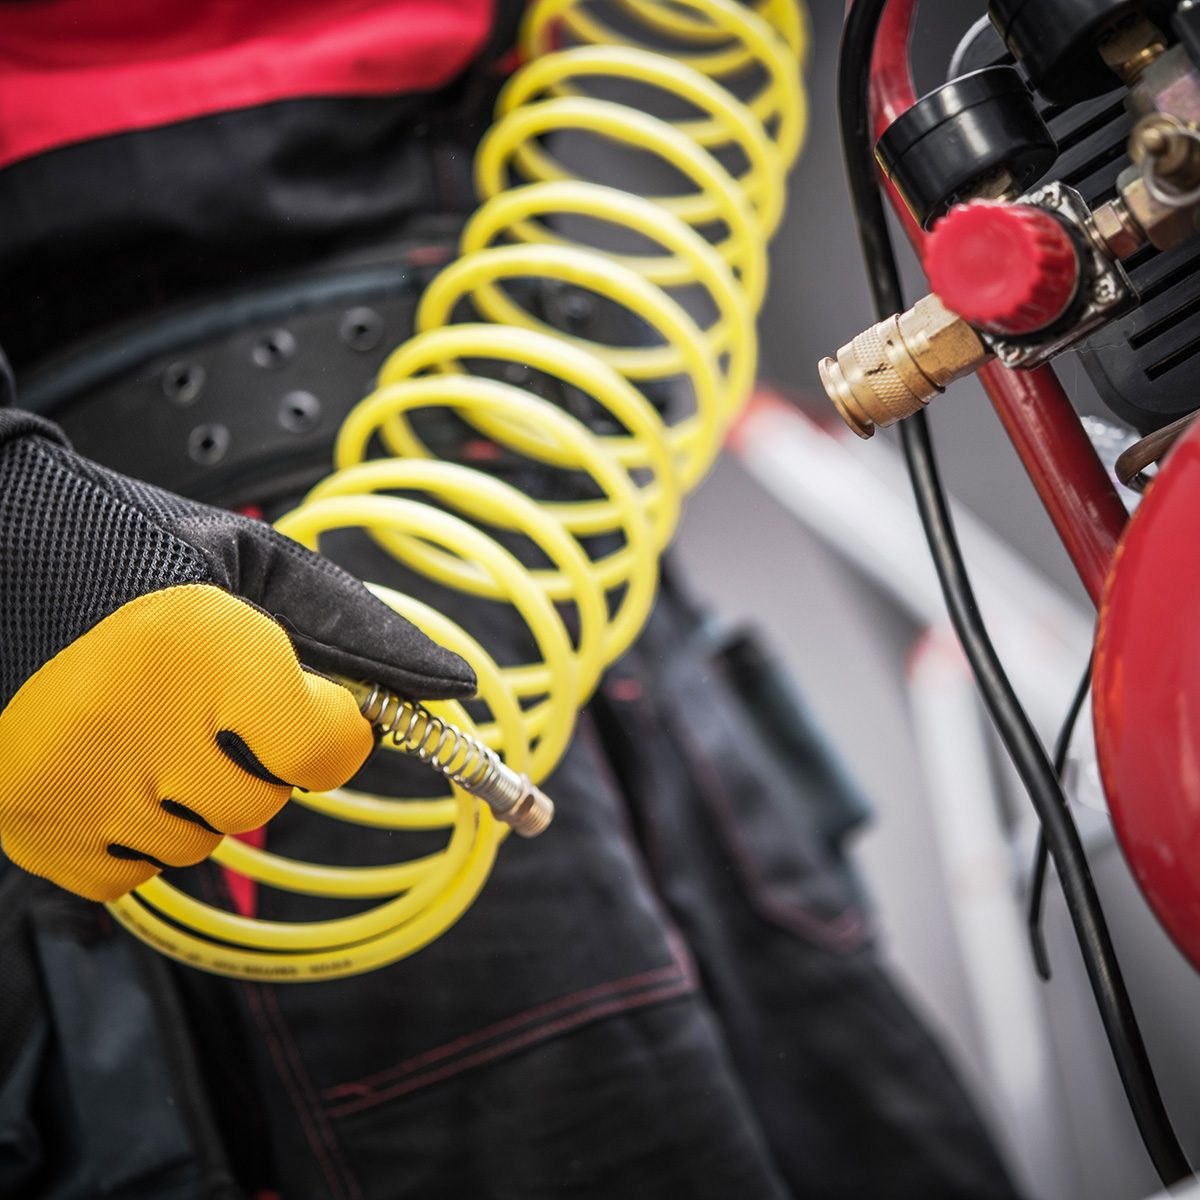 Air Compressor in a Hand. Professional Auto Service Equipment.